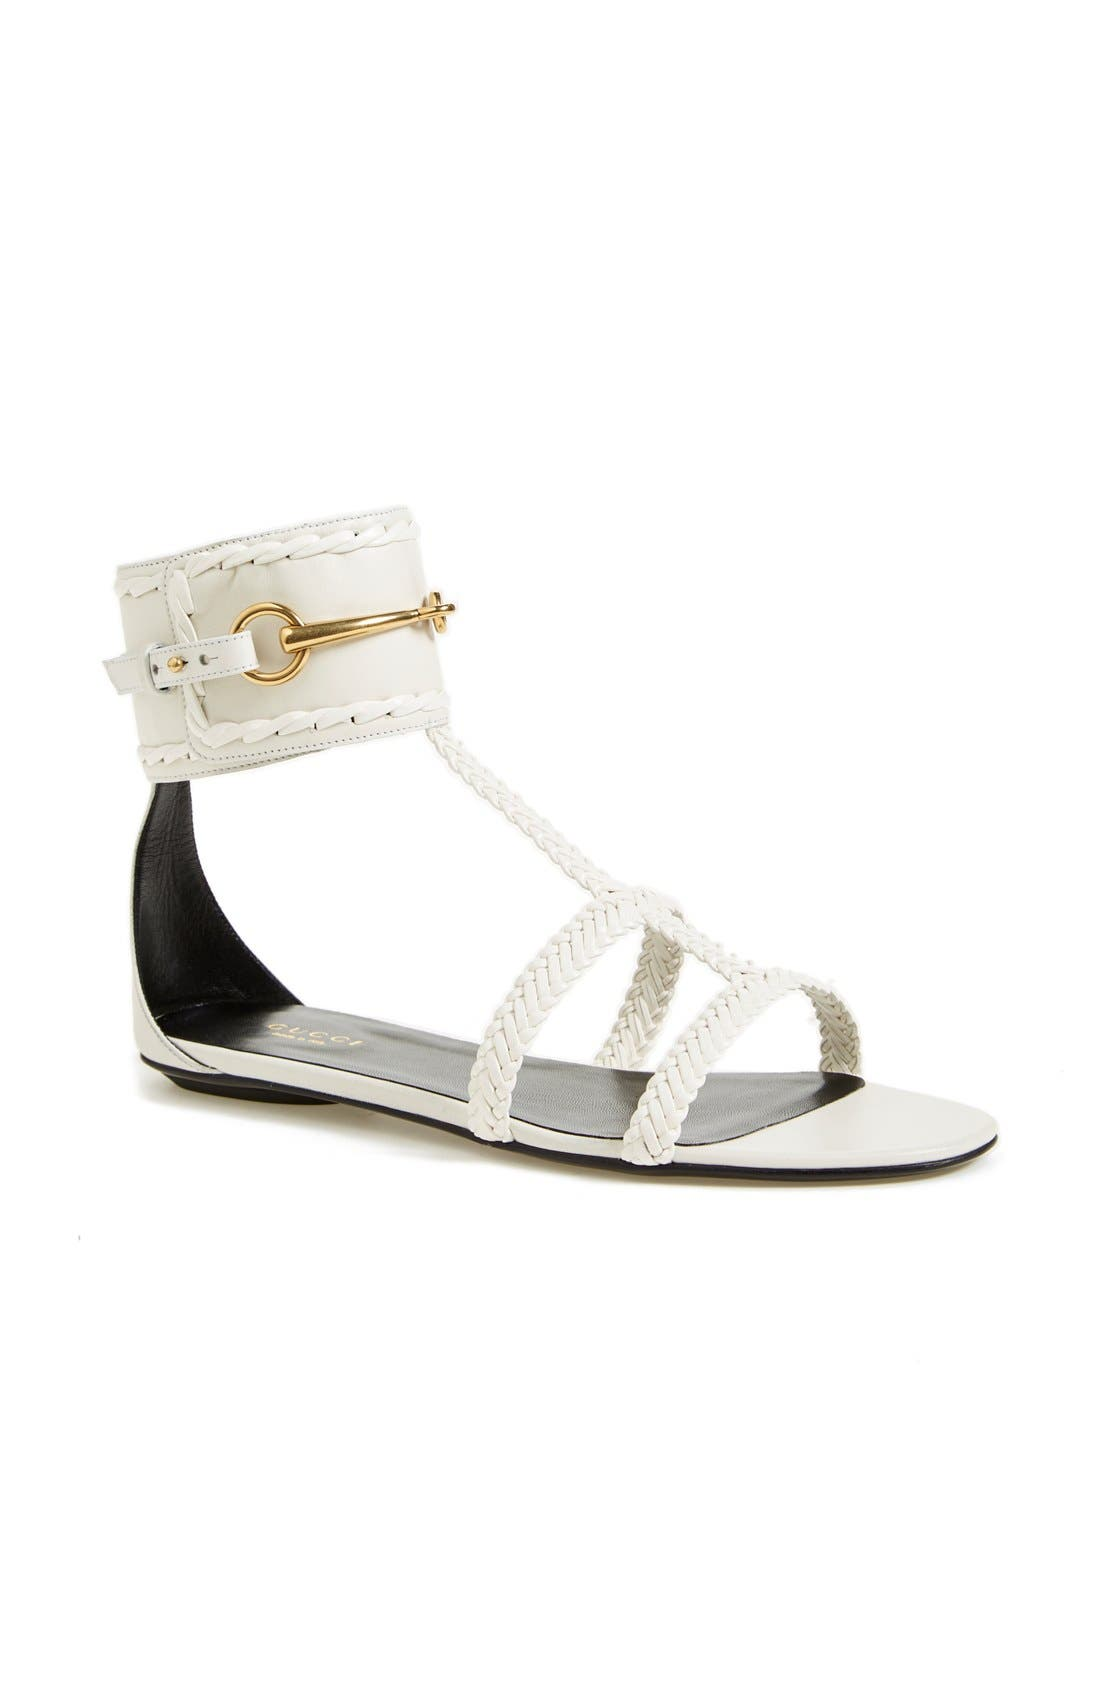 Main Image - Gucci 'Ursula' Braided Flat Sandal (Women)